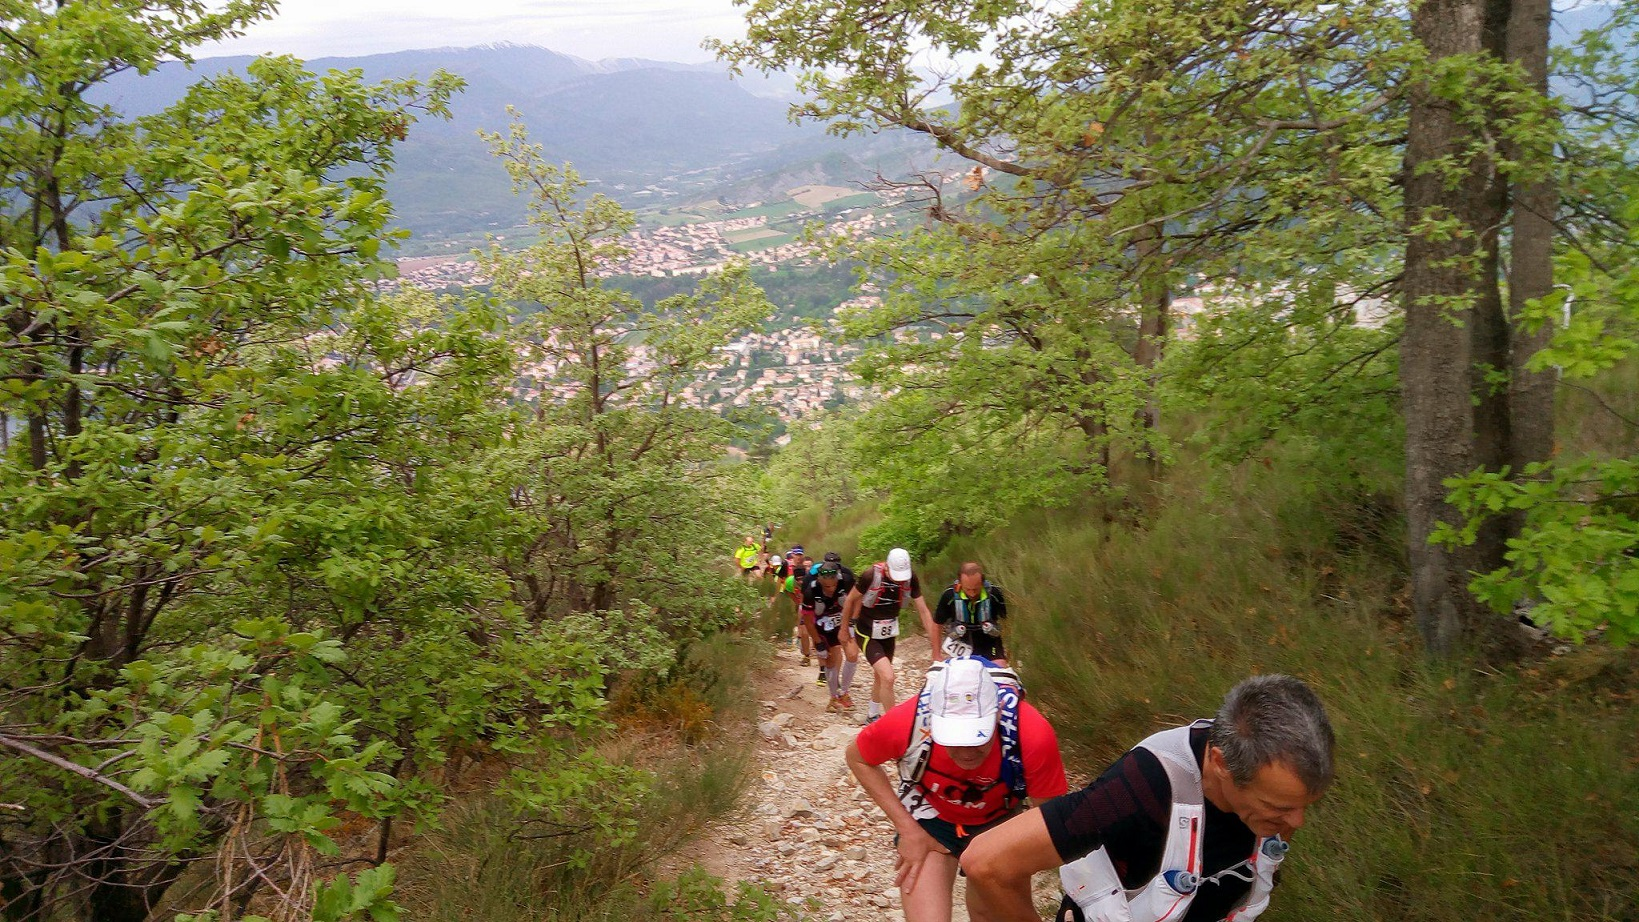 25-On s'éloigne petit à petit de Sisteron..